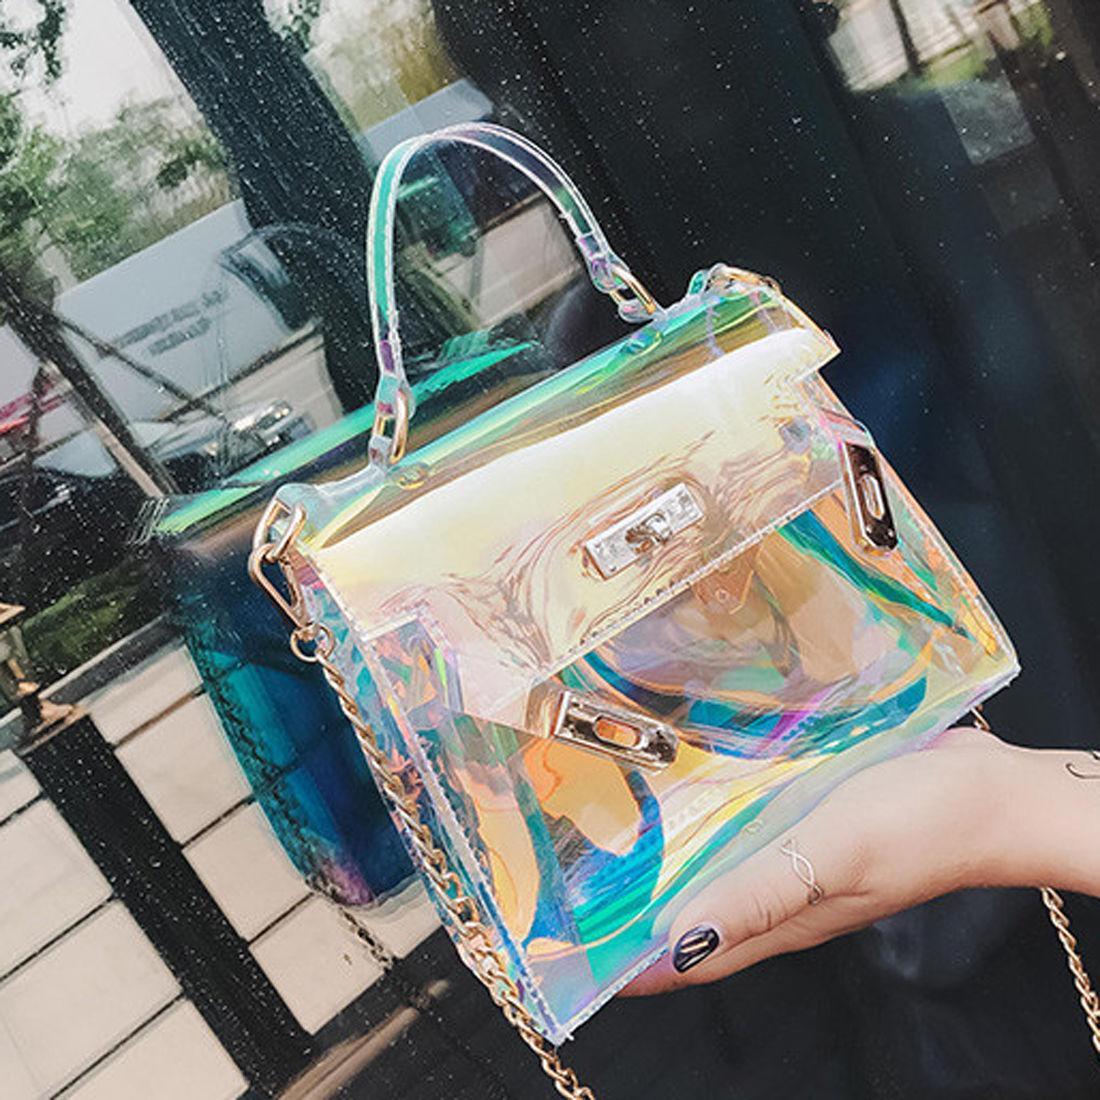 New Womens Fashion Clear Tote Messenger Cross Body Shoulder Jelly Bag  Handbag Laser Handbag Handbag Sale Side Bags From Fashion710 8b484502a3095